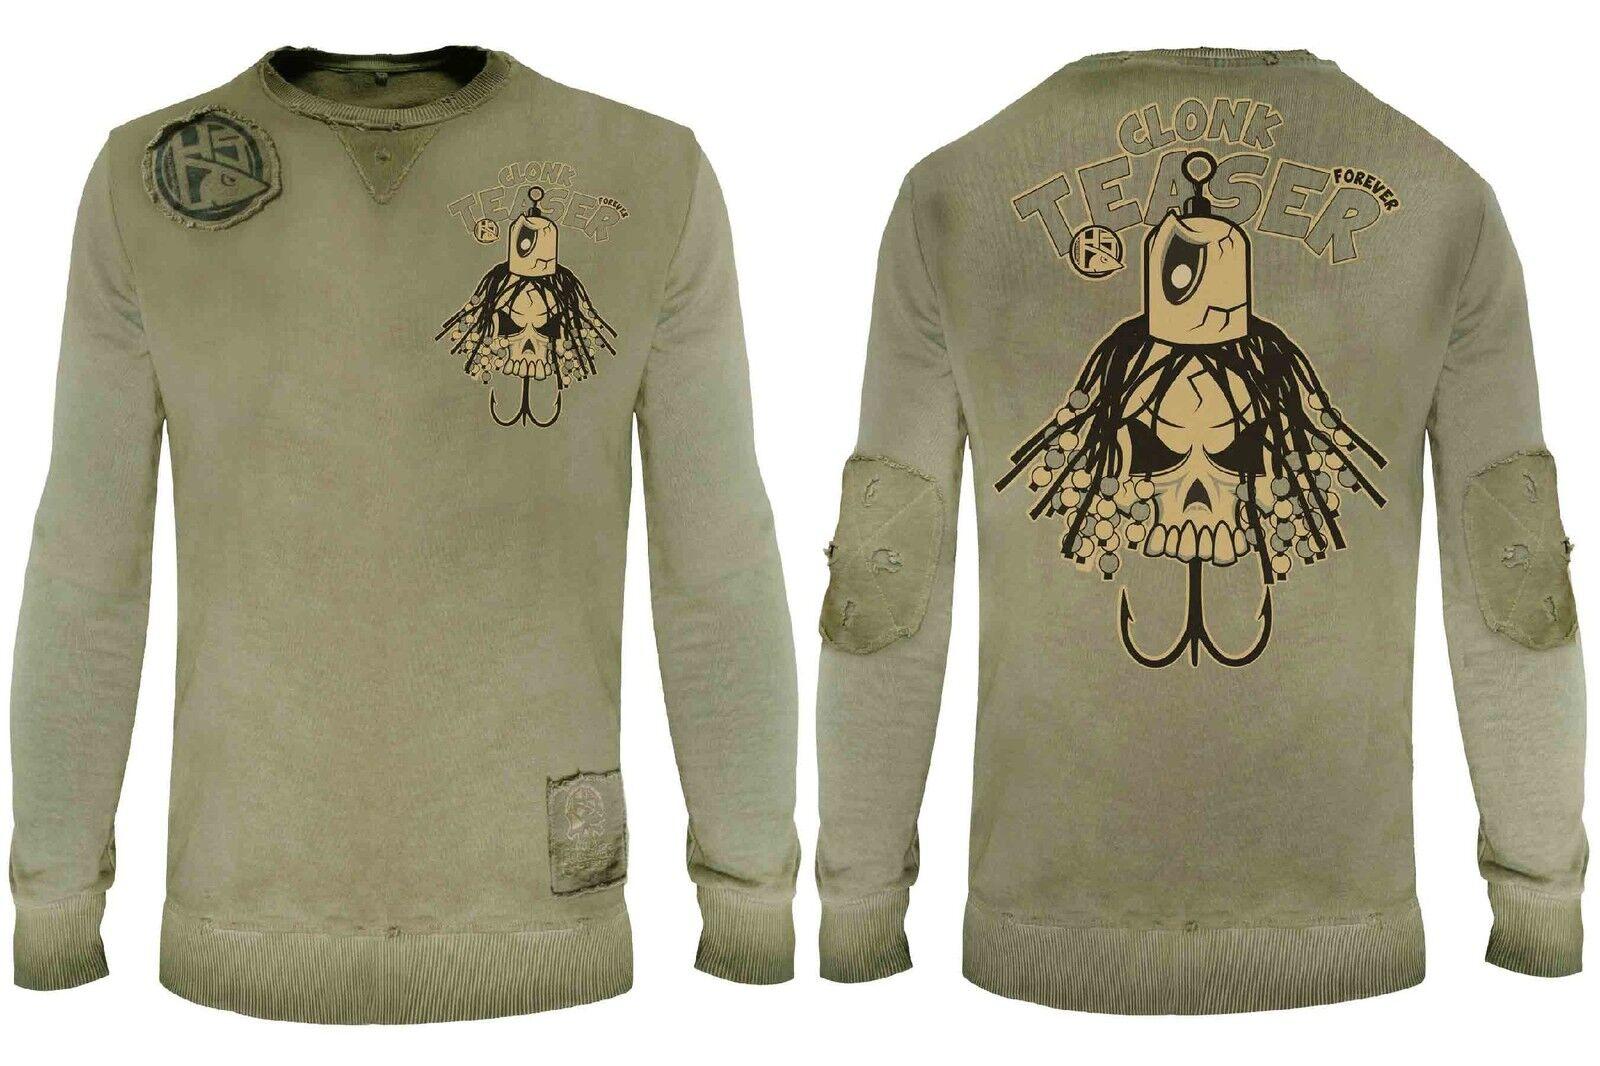 Hotspot Design Sweatshirt Teaser Clonk Teaser Sweatshirt Forever - Collection Vintage, gelb grün 3268f8